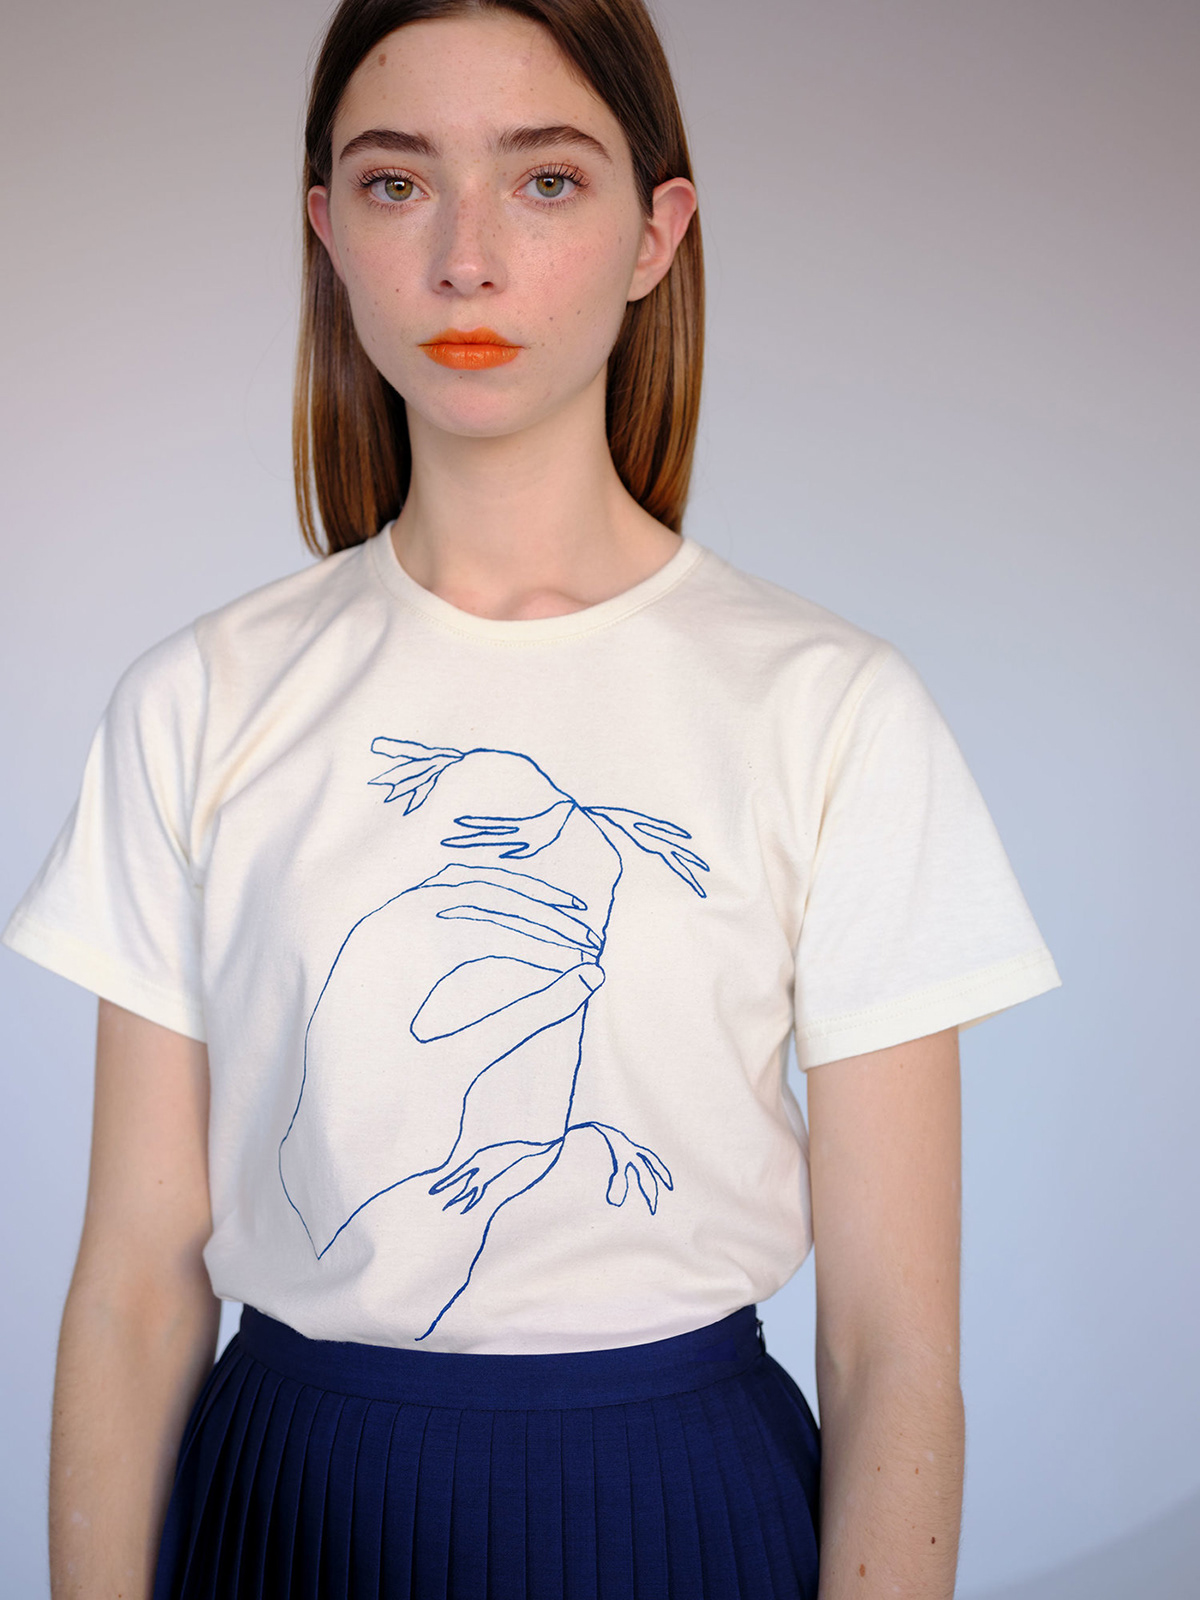 ILLUSTRATION  Fashion  Riso print Betina Lou Montreal clothes brand feminine design